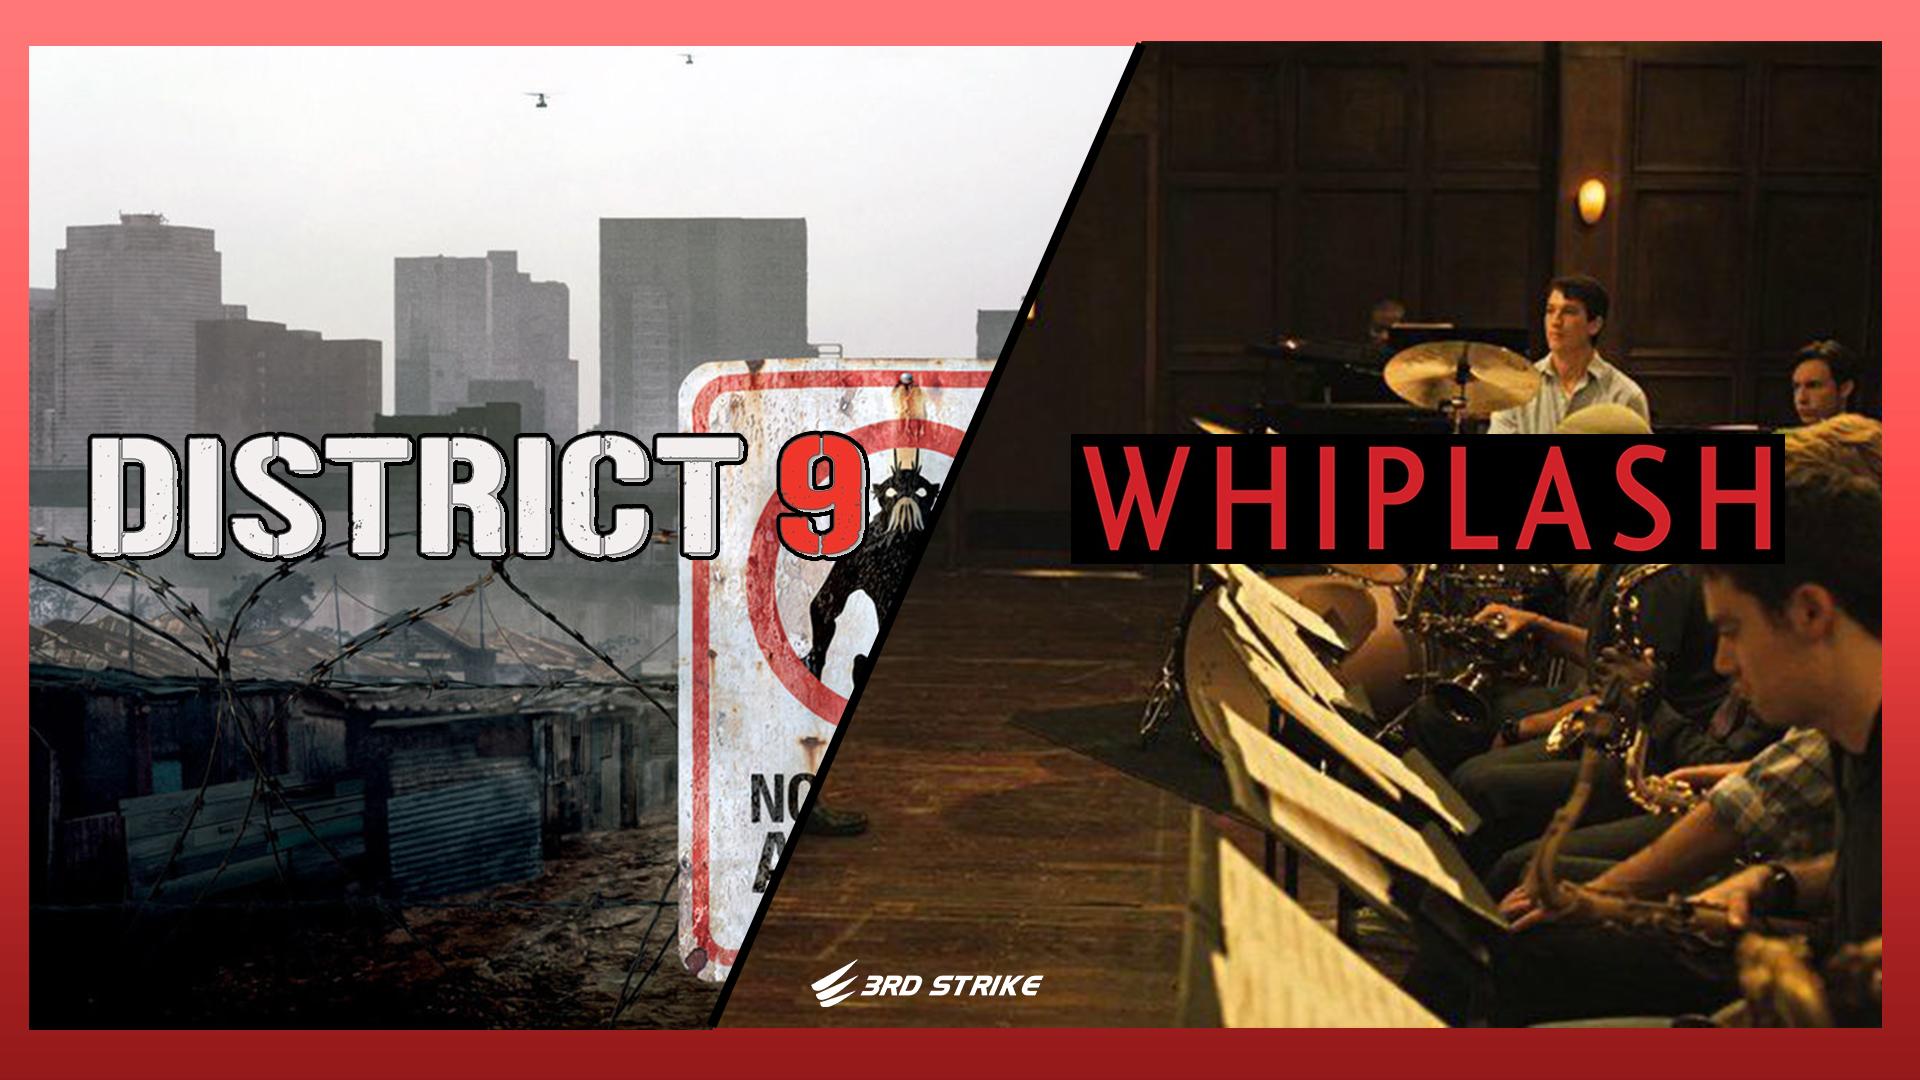 3rd Strike Com District 9 2009 And Whiplash 2014 4k Uhd Movie Reviews